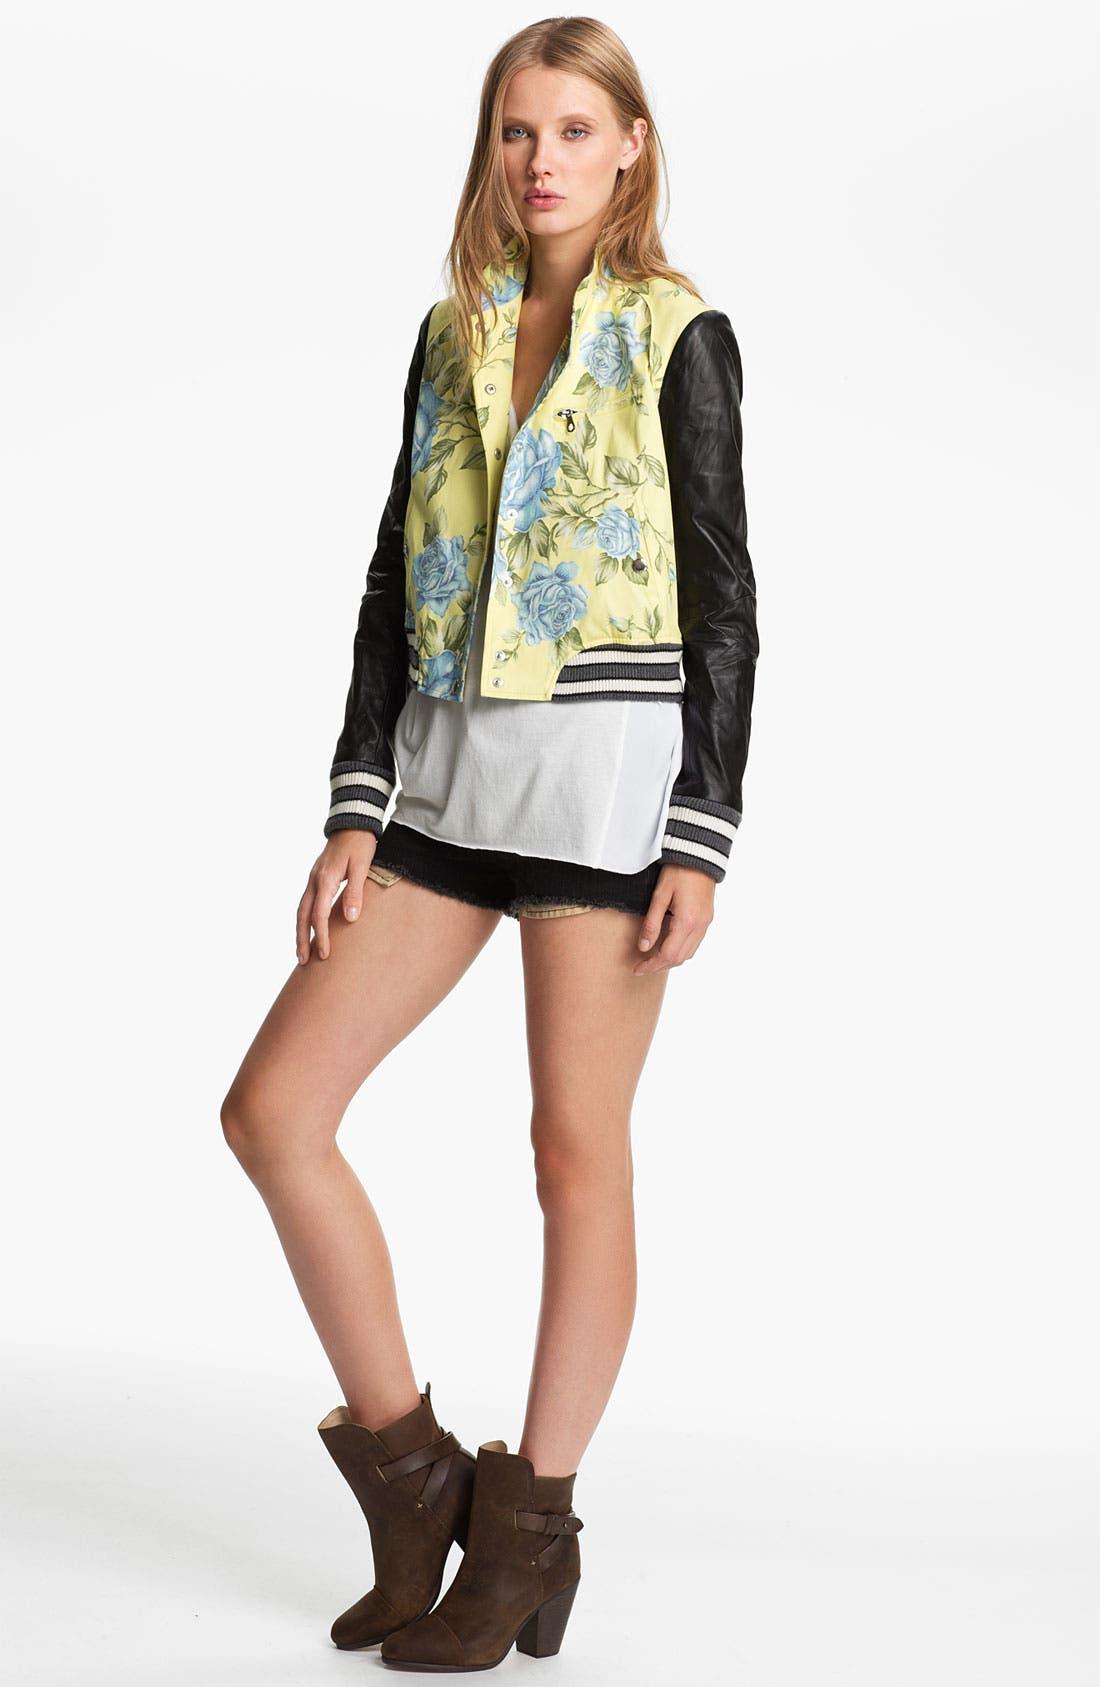 Alternate Image 1 Selected - rag & bone 'Cambridge' Floral Print Jacket